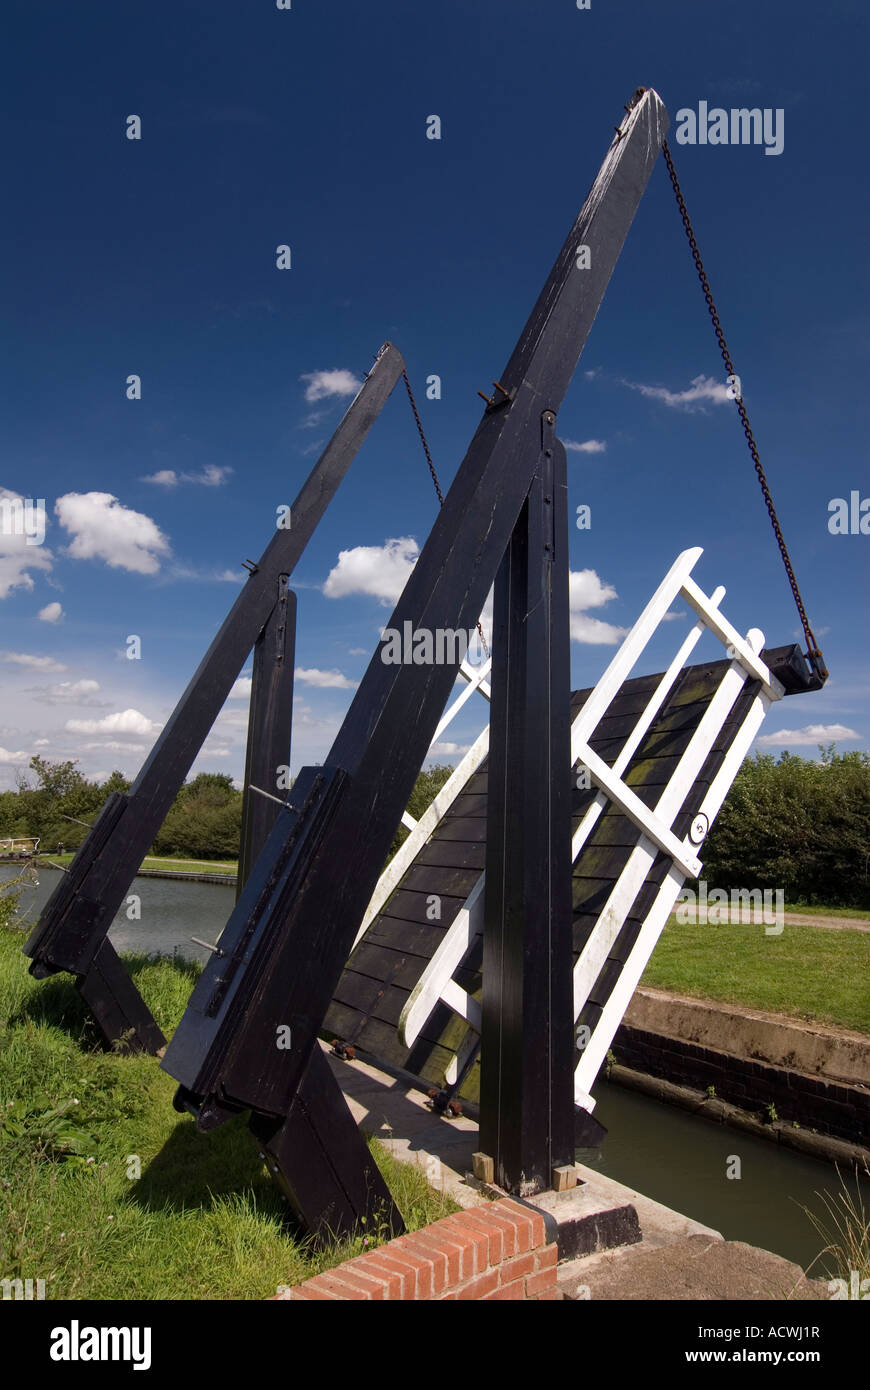 Doug Blane The Northampton arm of the Grand Union canal - Stock Image